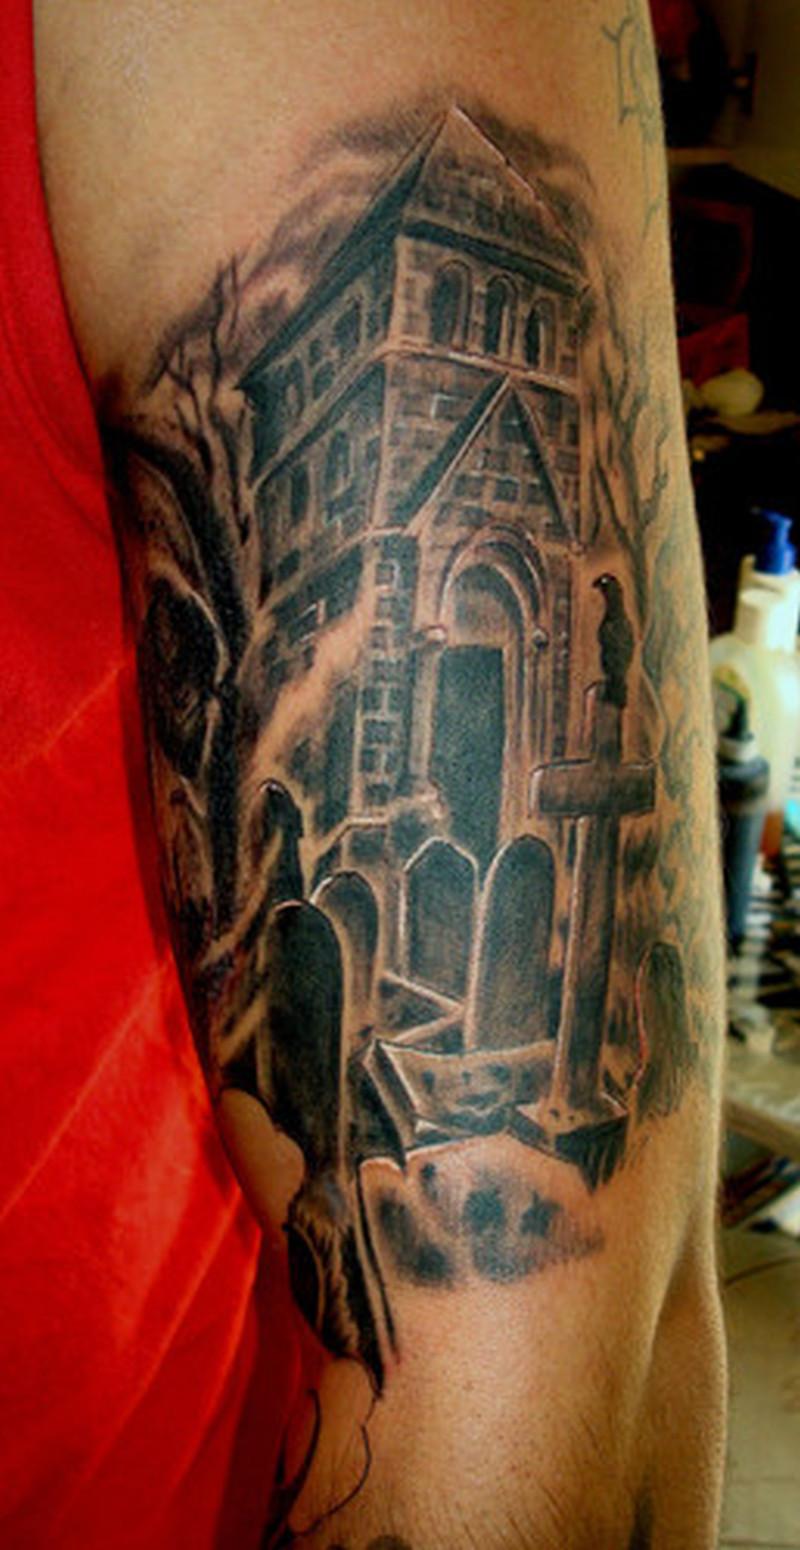 Graveyard tattoo design on the arm 2